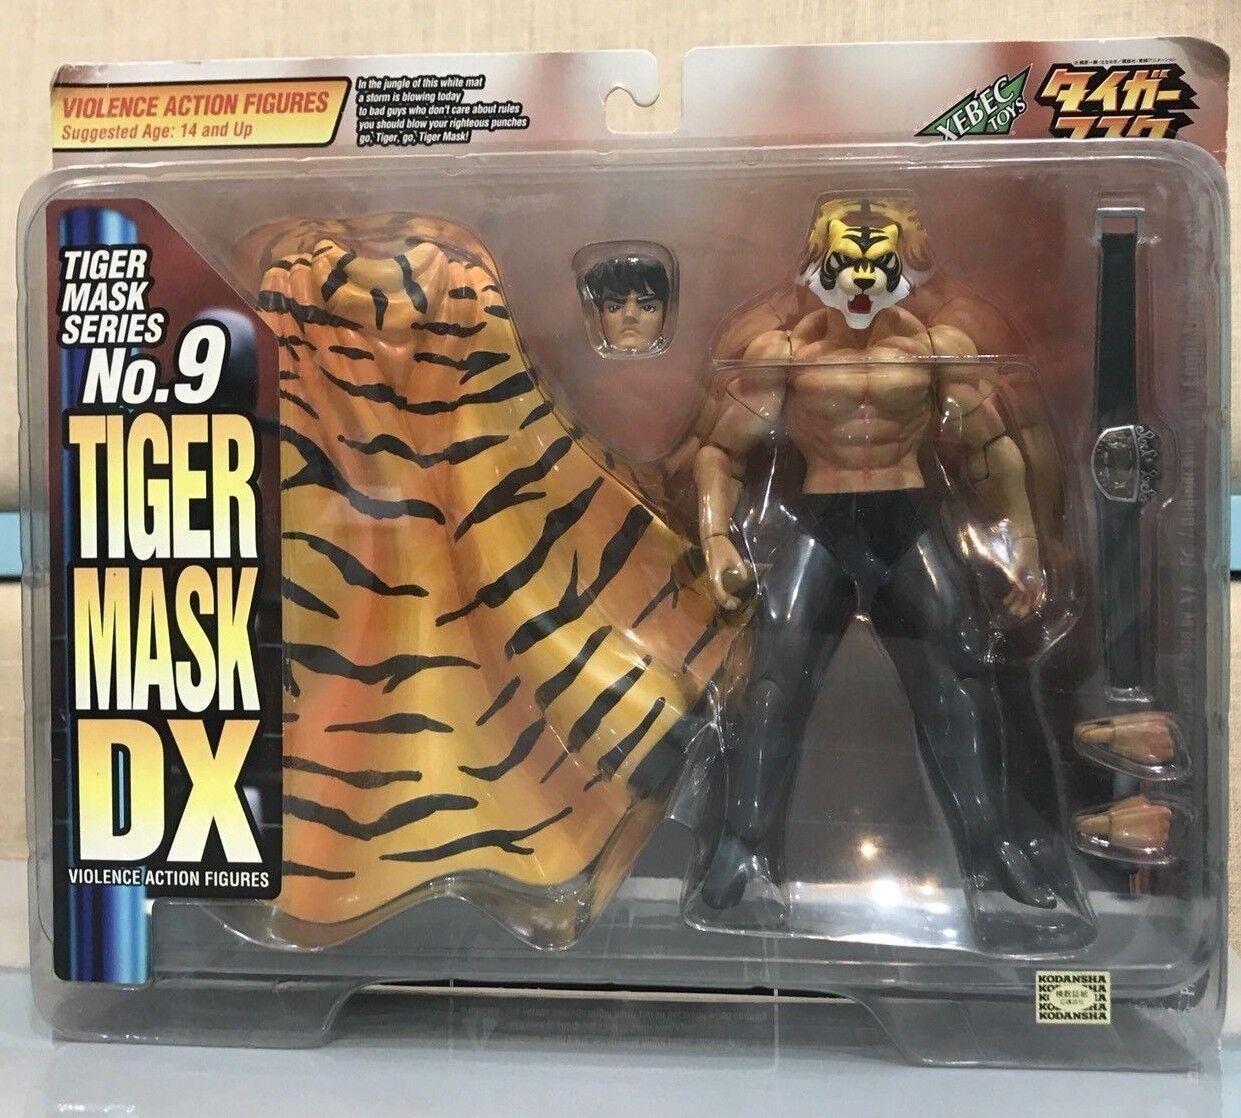 Rare KAIYODO Violence Action Figures Tiger Mask D X Tiger Mask Series No.9